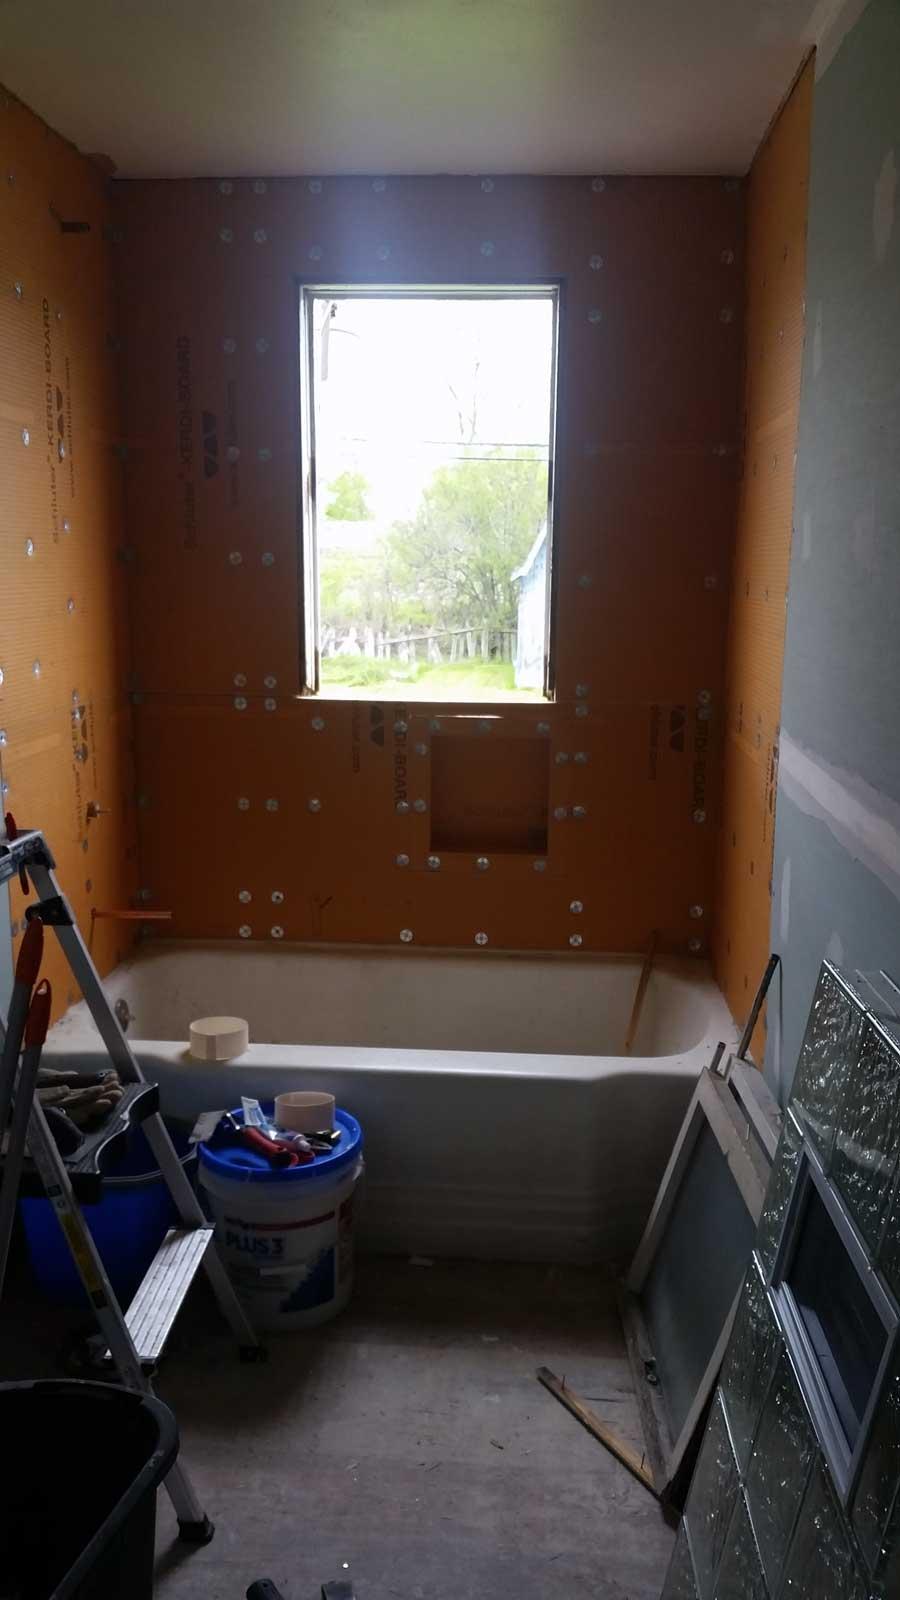 15-Day-Bathroom-Renovation-16.jpg